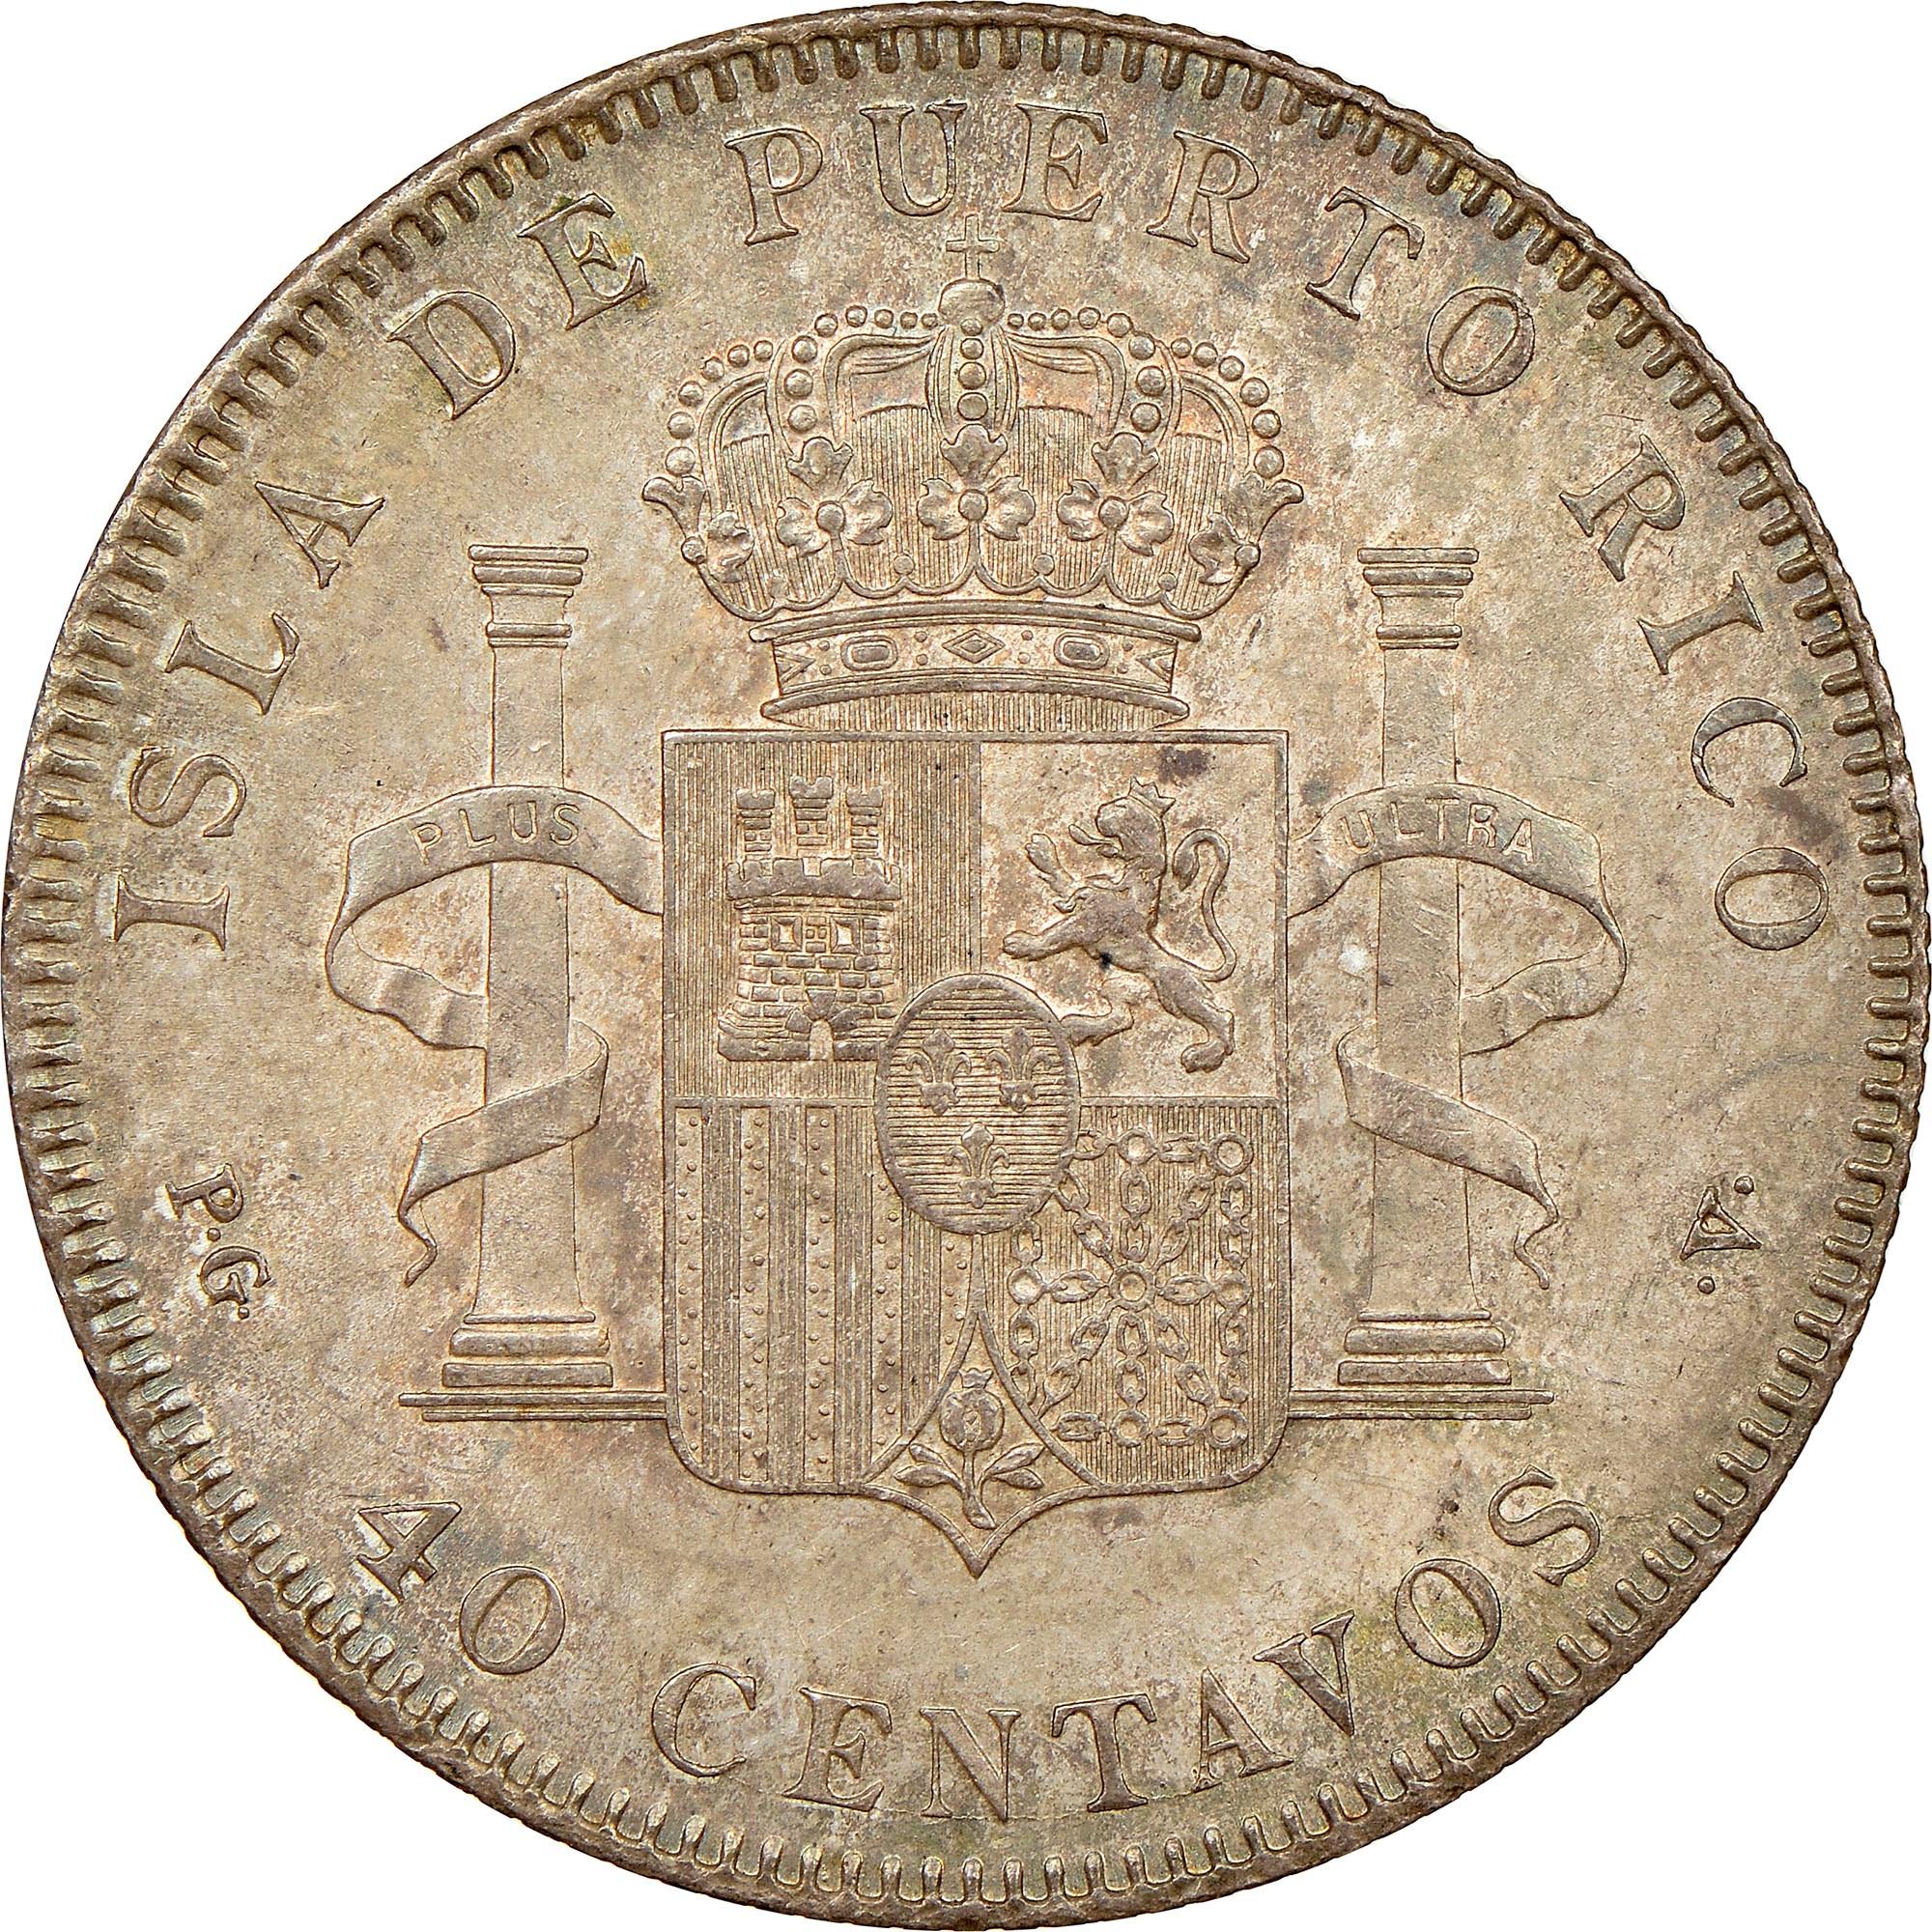 Puerto Rico 40 Centavos reverse